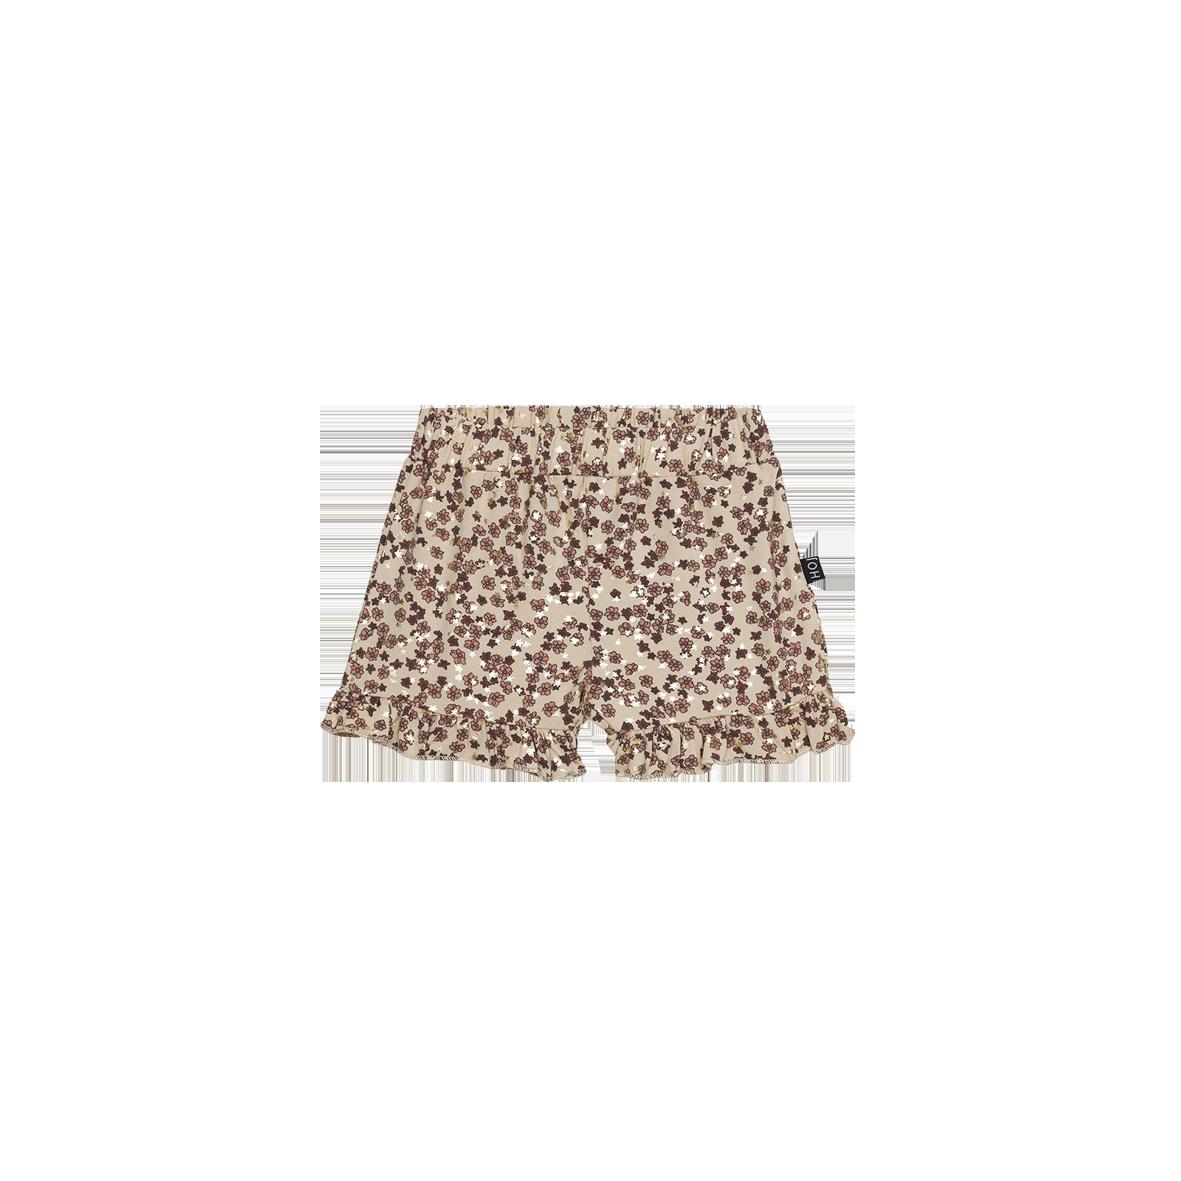 Ruffles shorts Golden rose Dawn Blossom